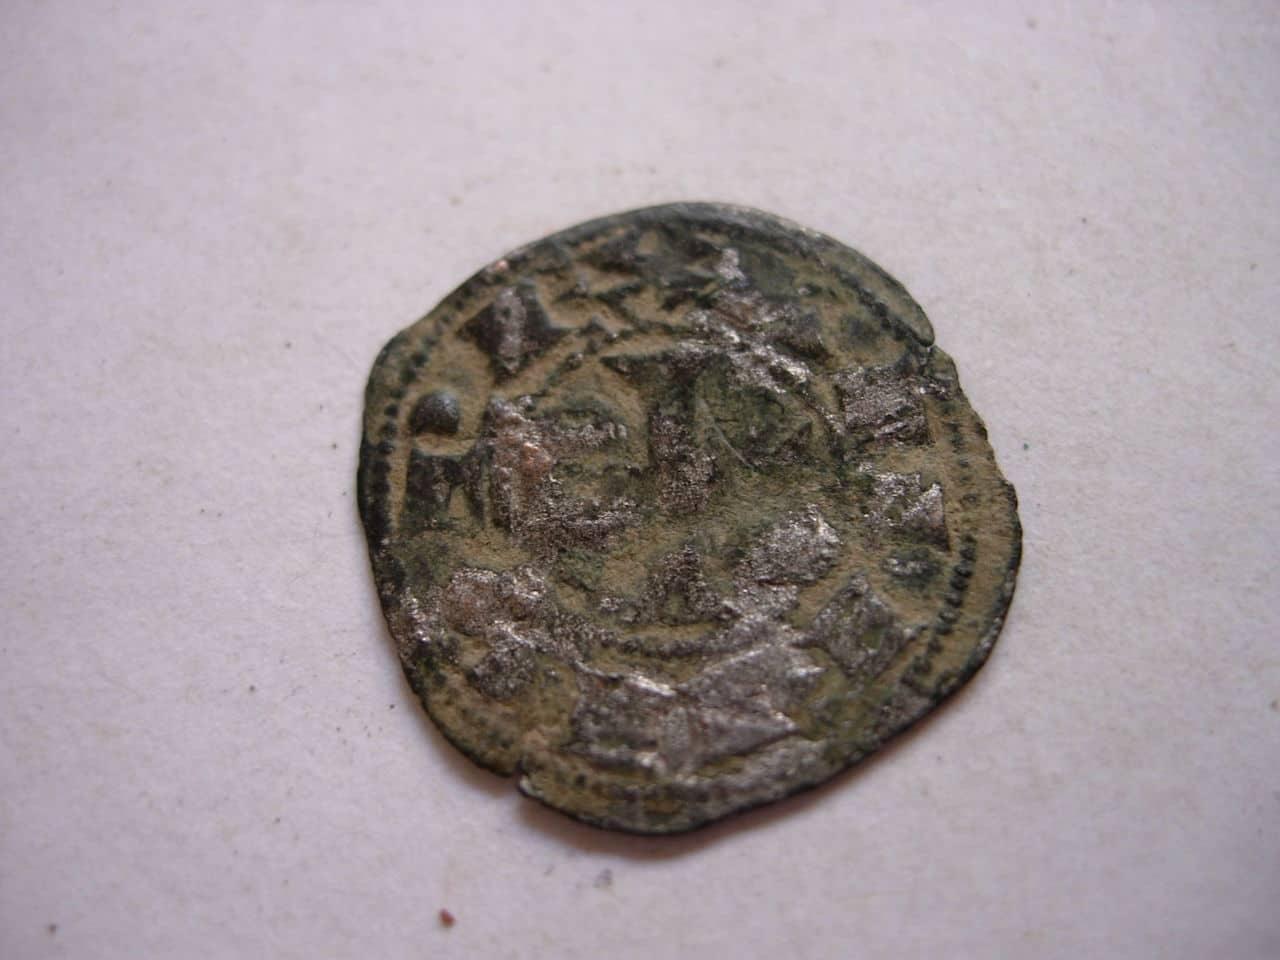 Dinero de Alfonso VIII. Jinete sosteniendo palma. (1158-1214). Toledo. Baj_204